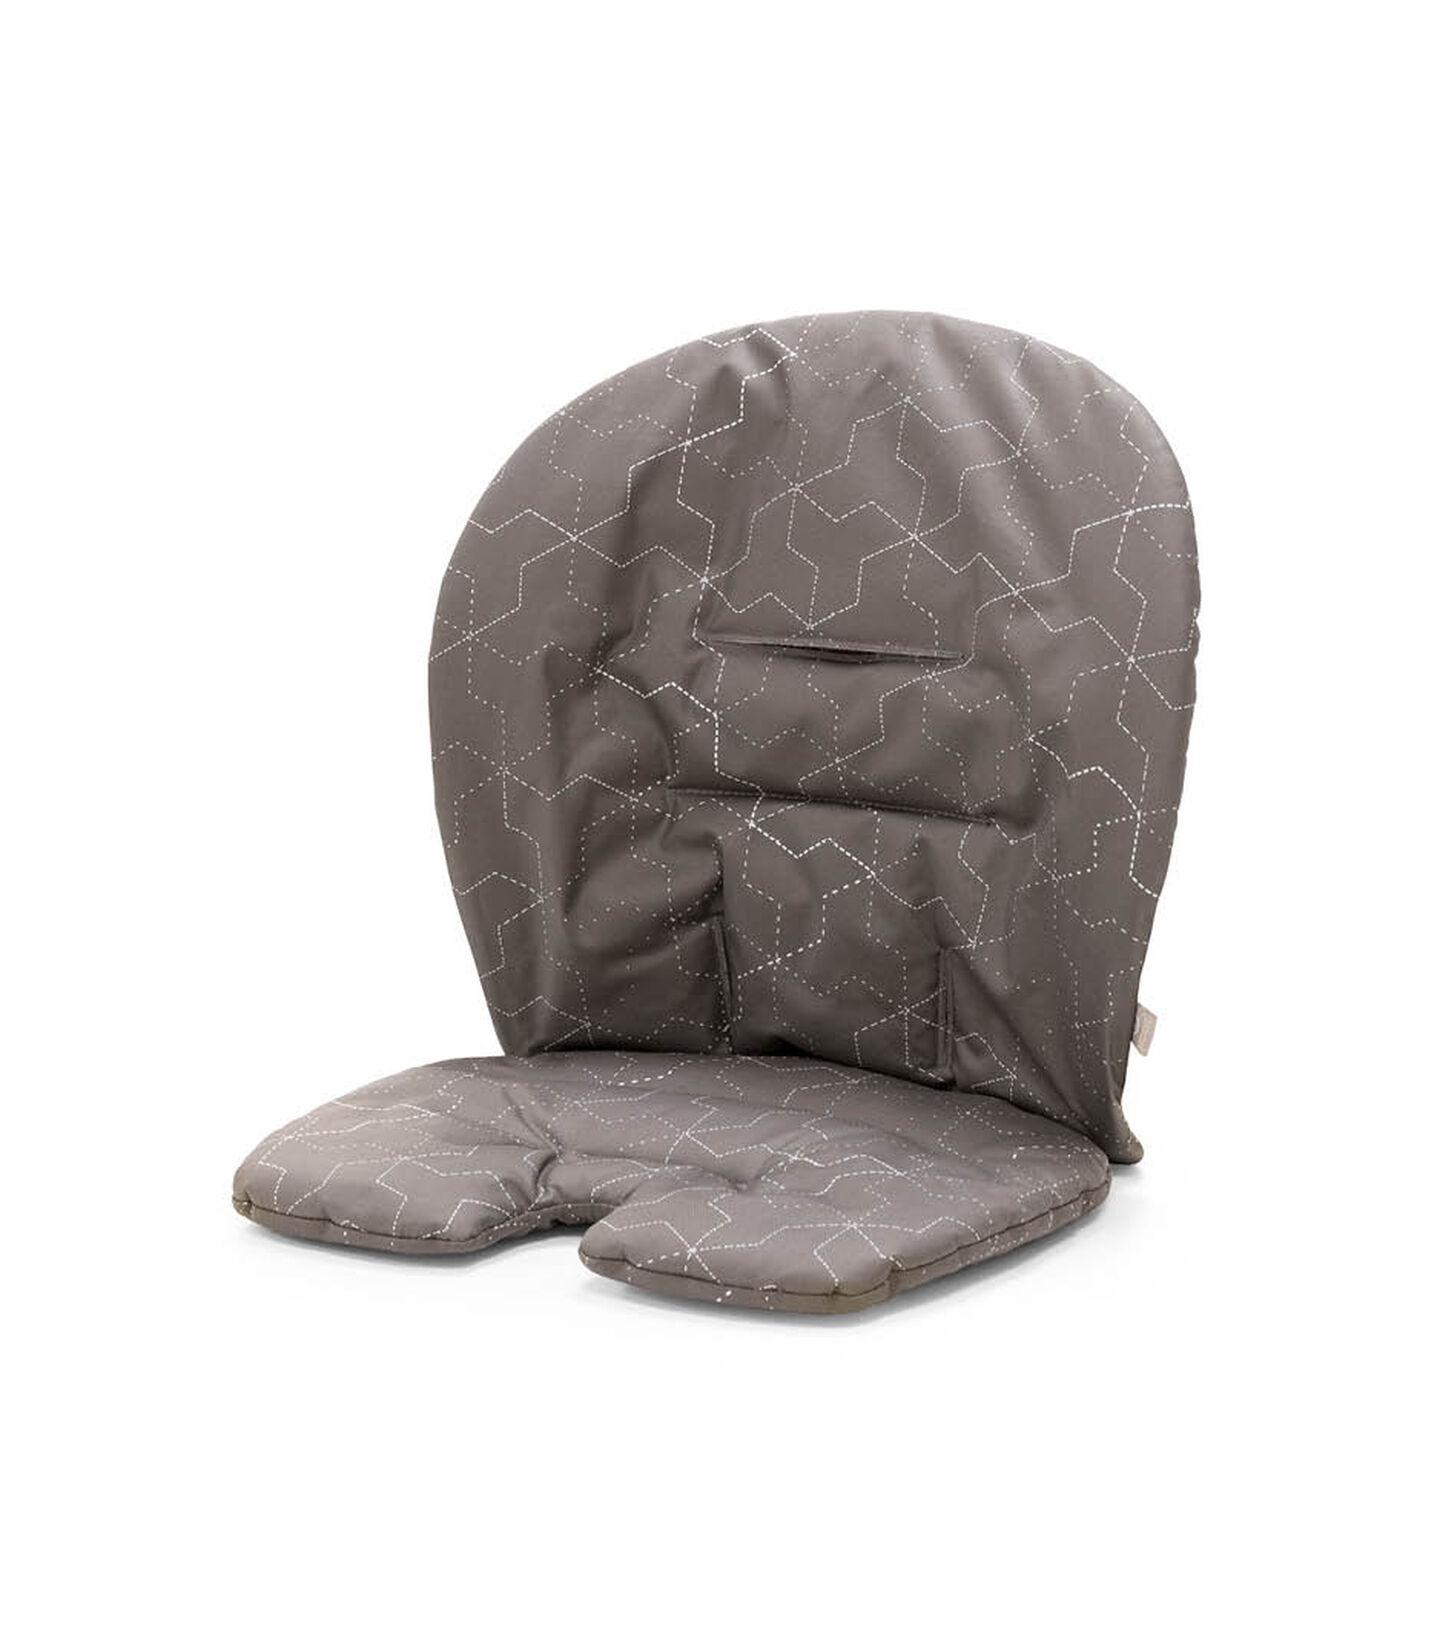 Stokke® Steps™ Baby Set Cushion Geometric Grey, Geometric Grey, mainview view 2